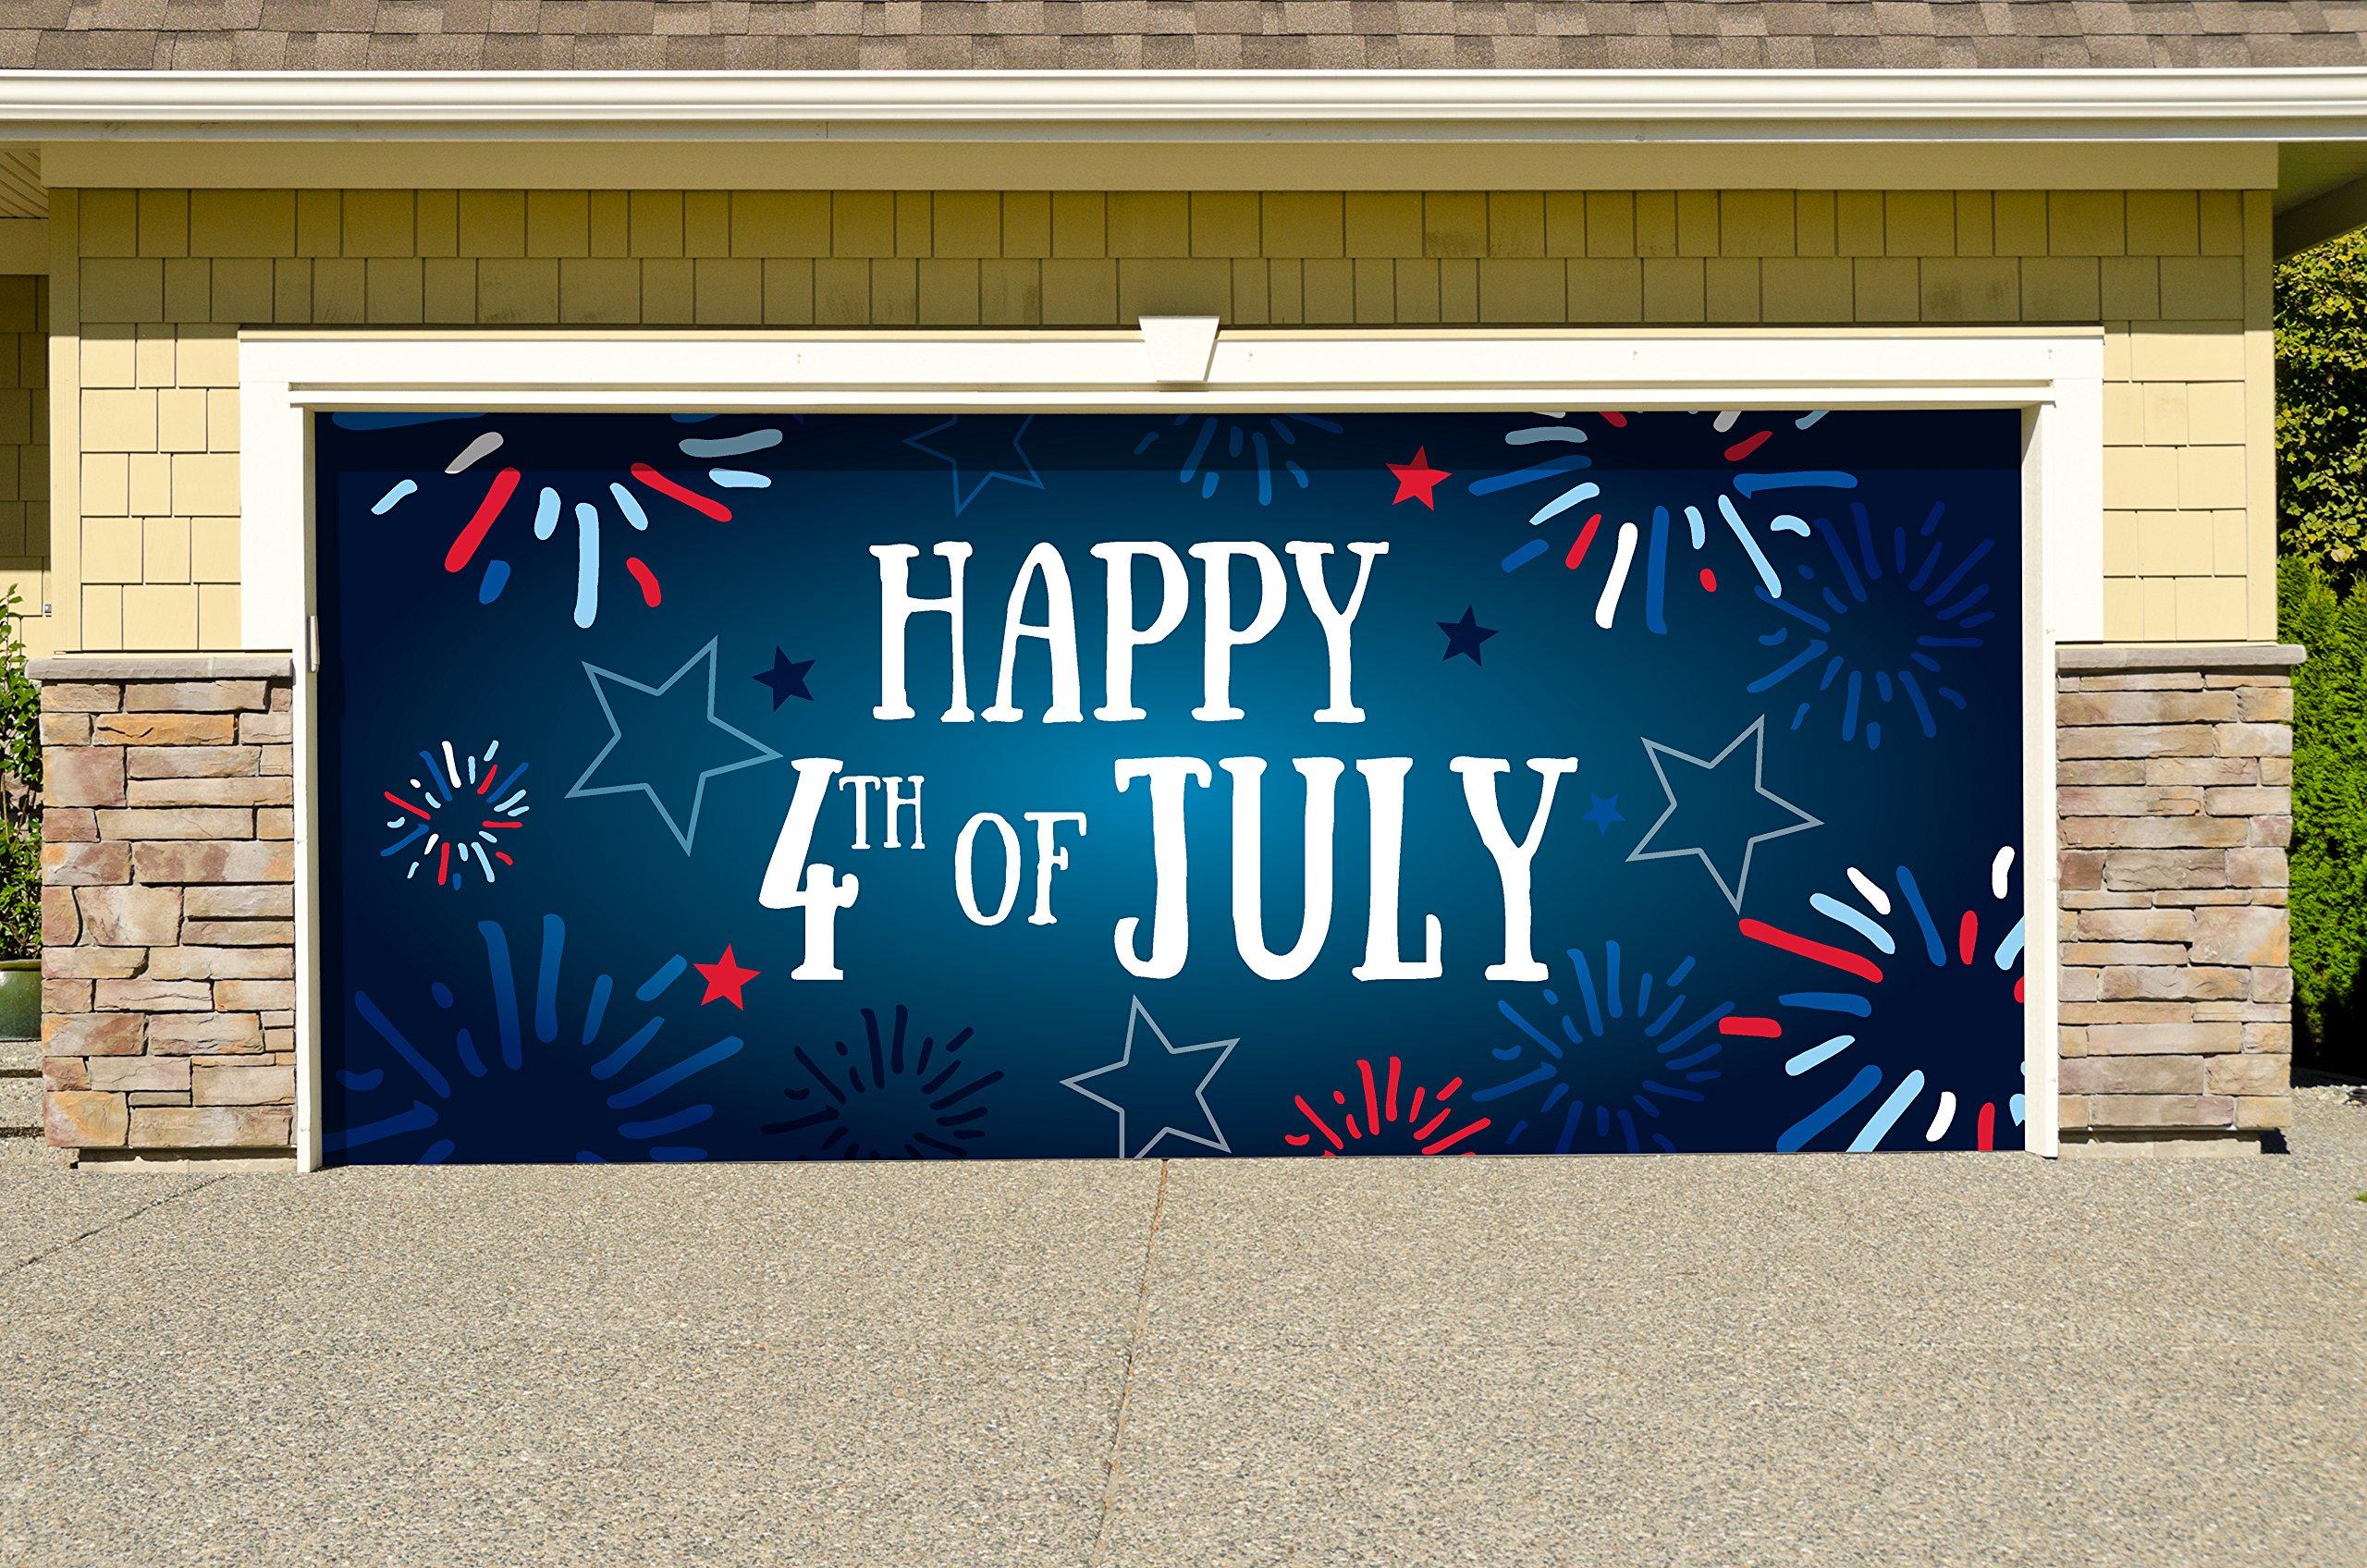 Outdoor Patriotic American Holiday Garage Door Banner Cover Mural Décoration - Fireworks Happy 4th of July - Outdoor American Holiday Garage Door Banner Décor Sign 7'x 16'